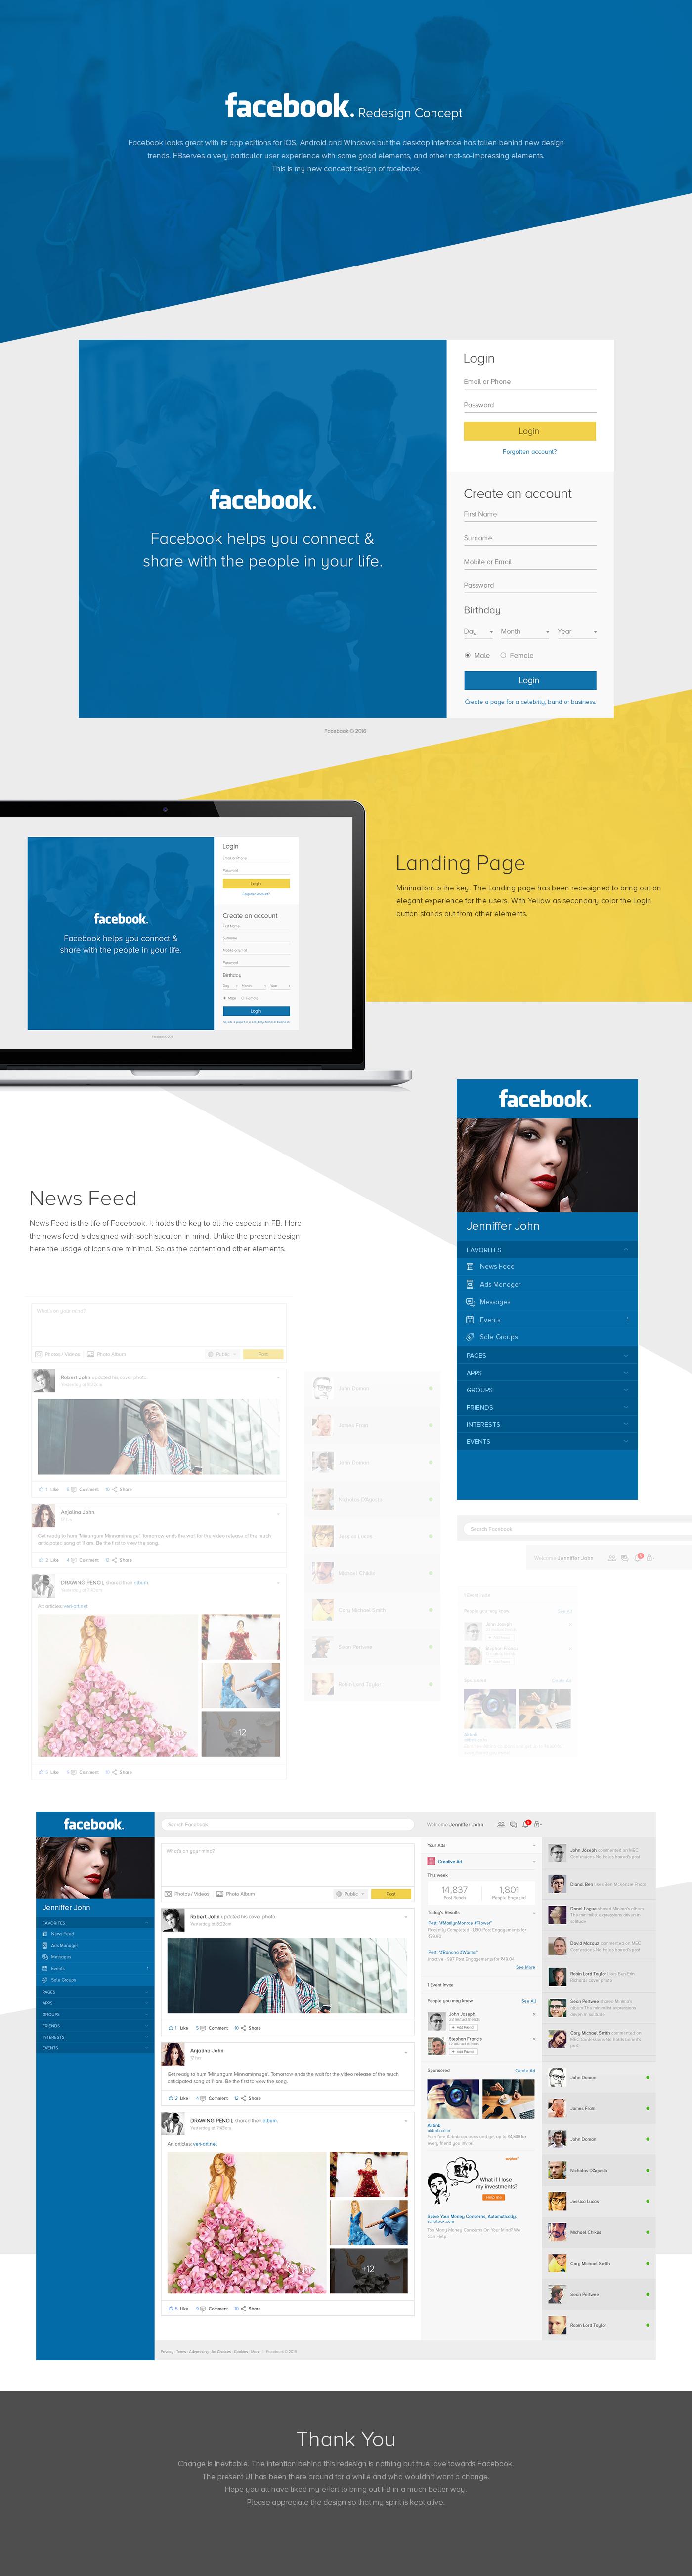 facebook redesign Facebook Redesign Concept concept design Redesigning concept Facebook Redesigning Concepts Website Design news feed login page